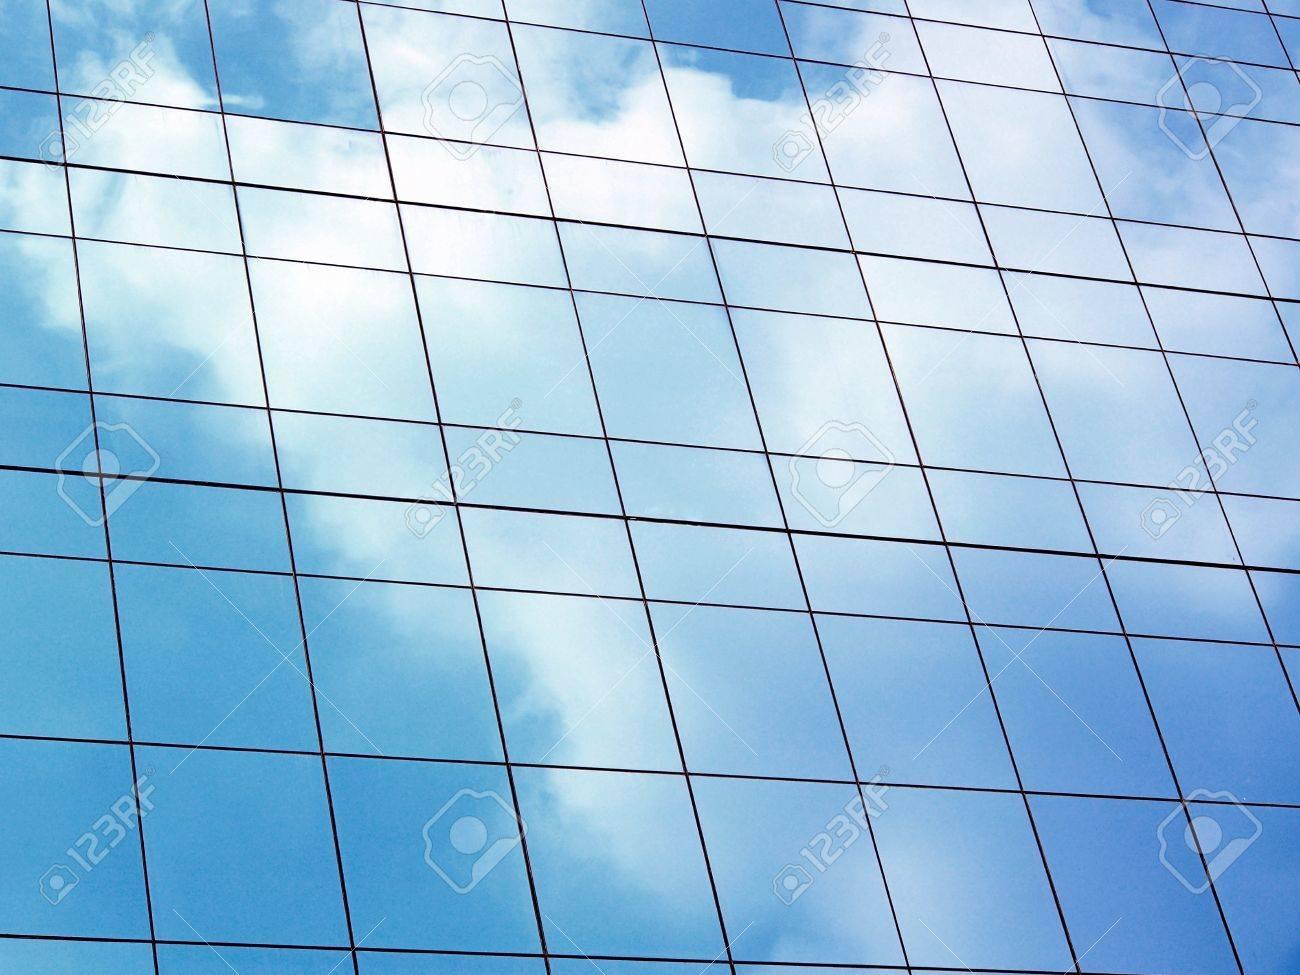 edificio espejo de pared de vidrio foto de archivo